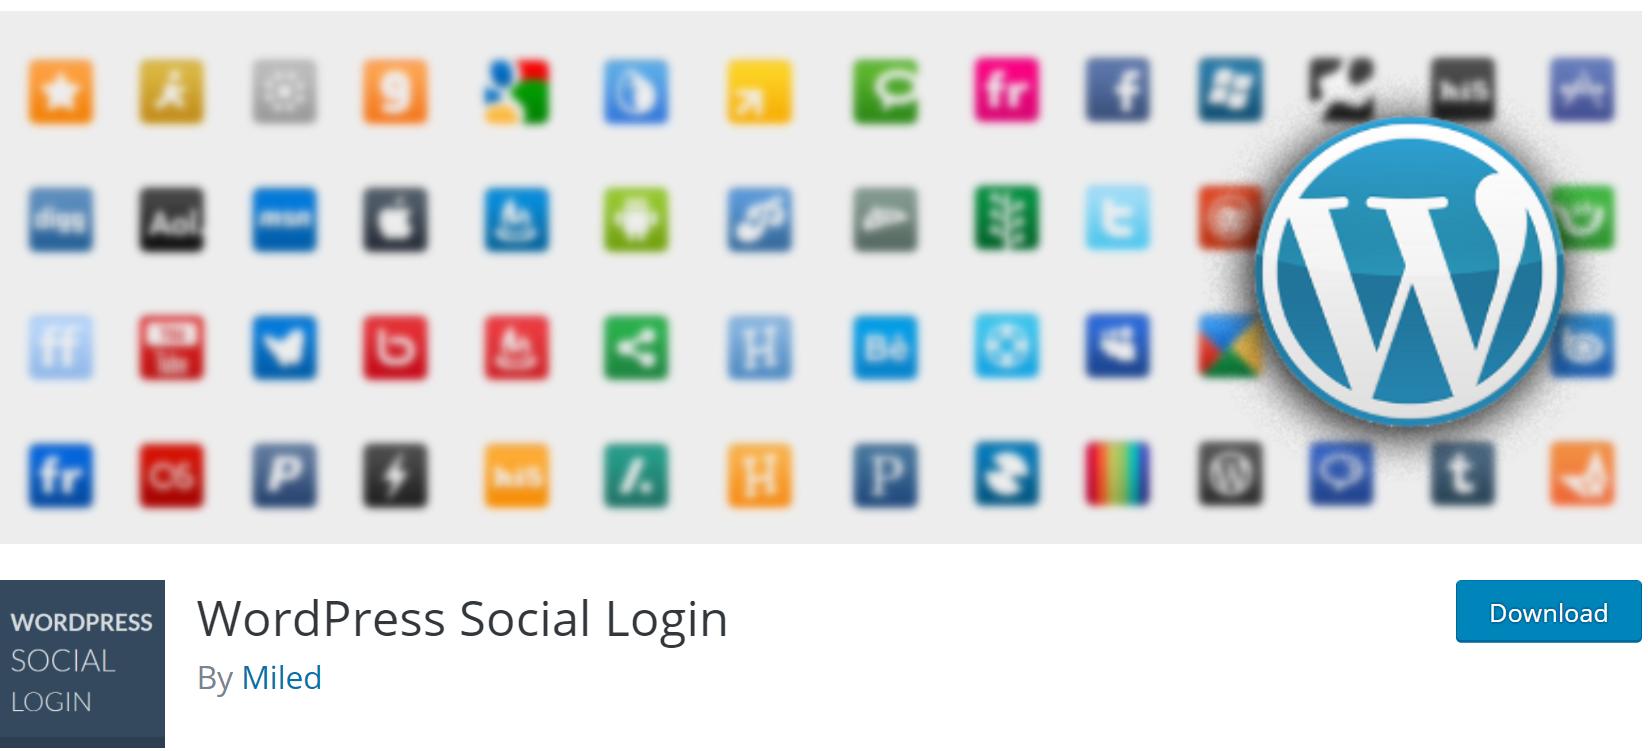 WordPress Social Login banner